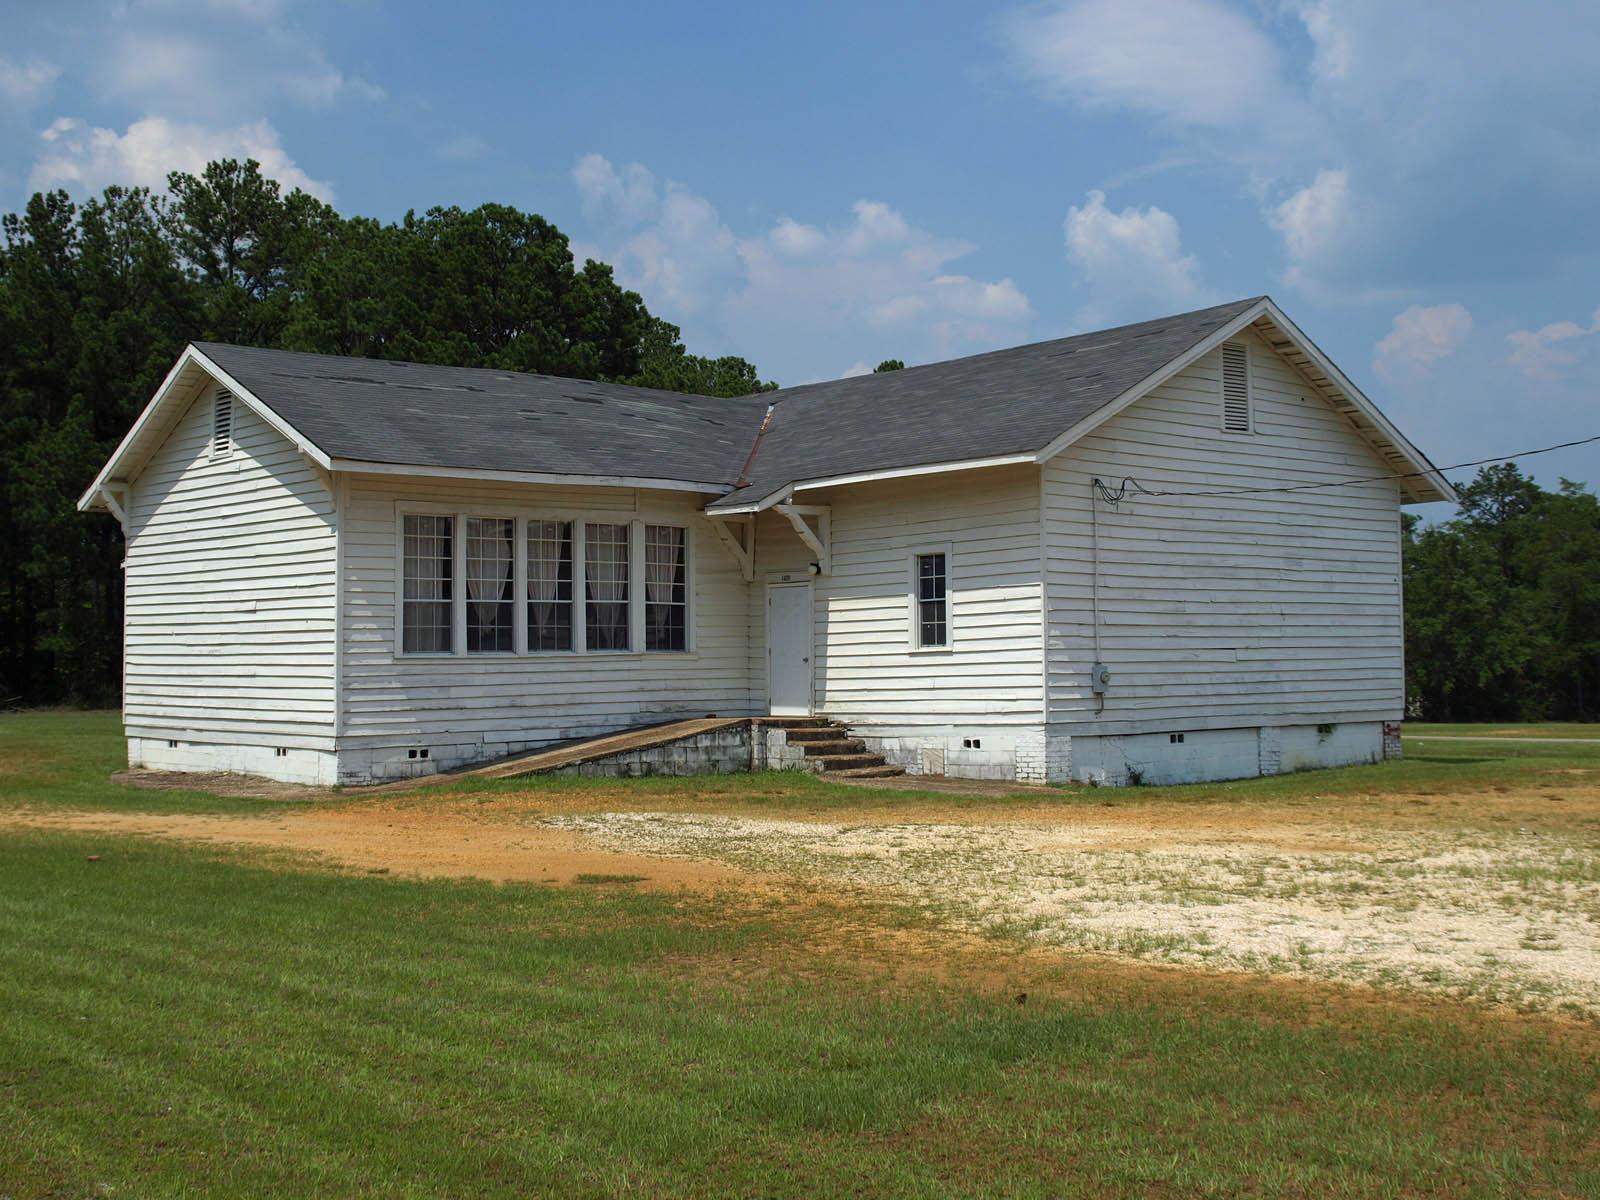 Autauga County Property Records Search